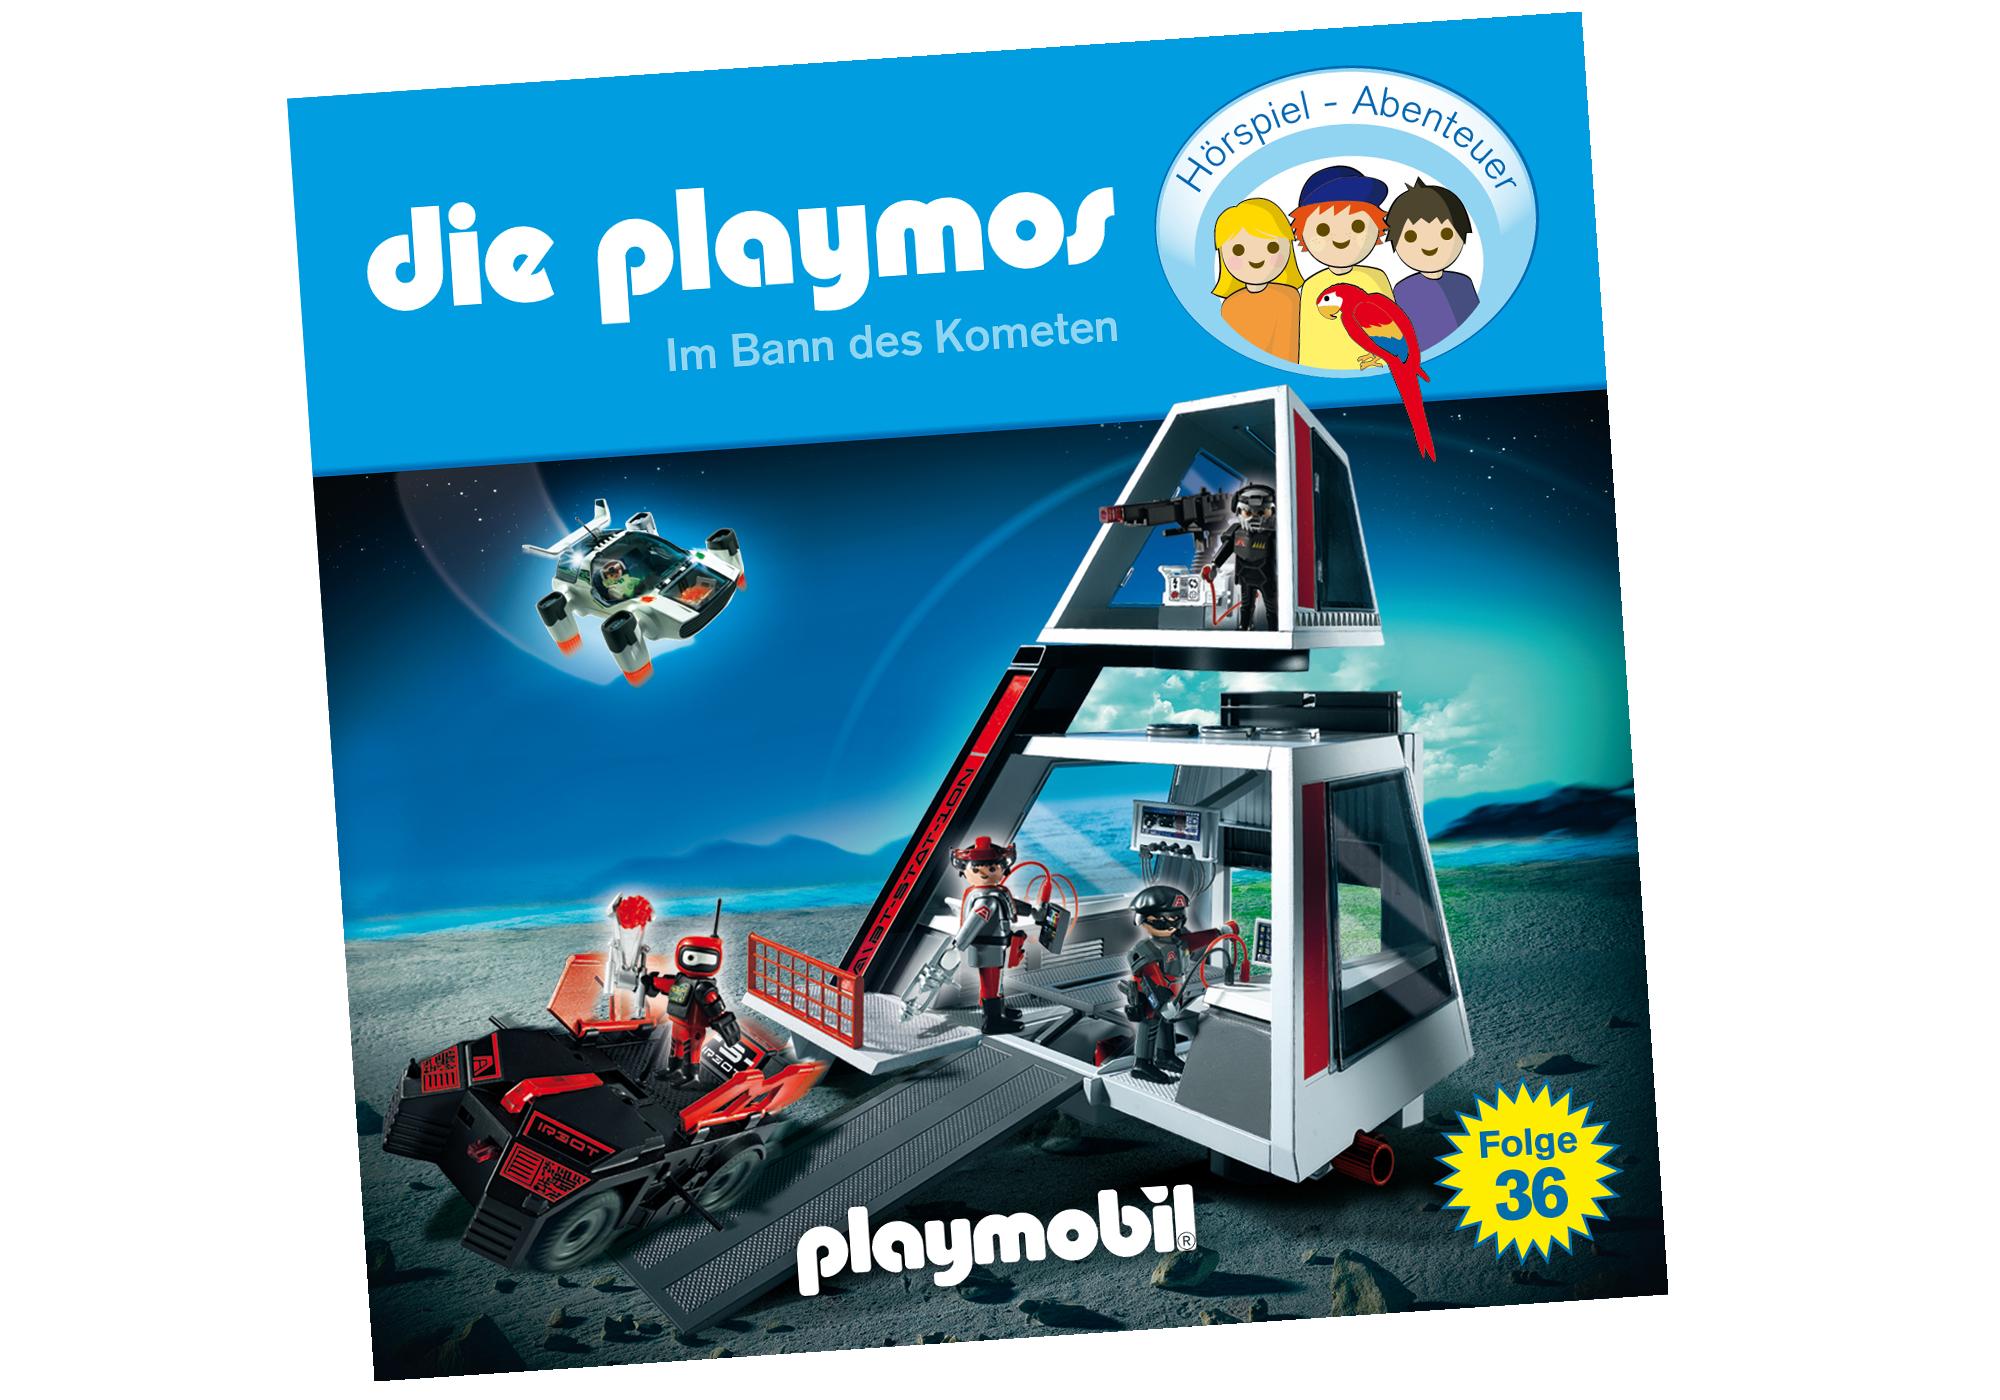 http://media.playmobil.com/i/playmobil/80447_product_detail